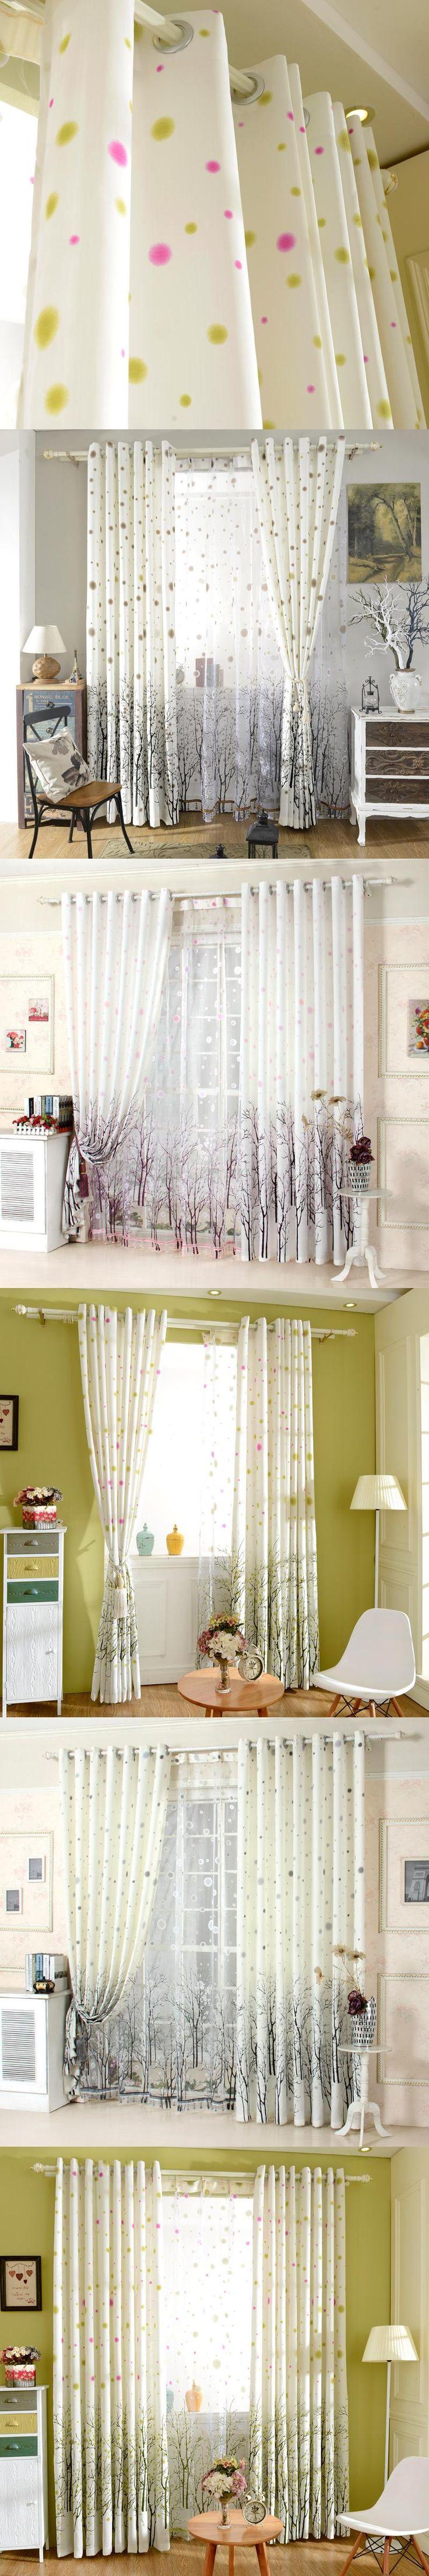 1piece readymade rural garden curtains lauxuerun windows cortinas